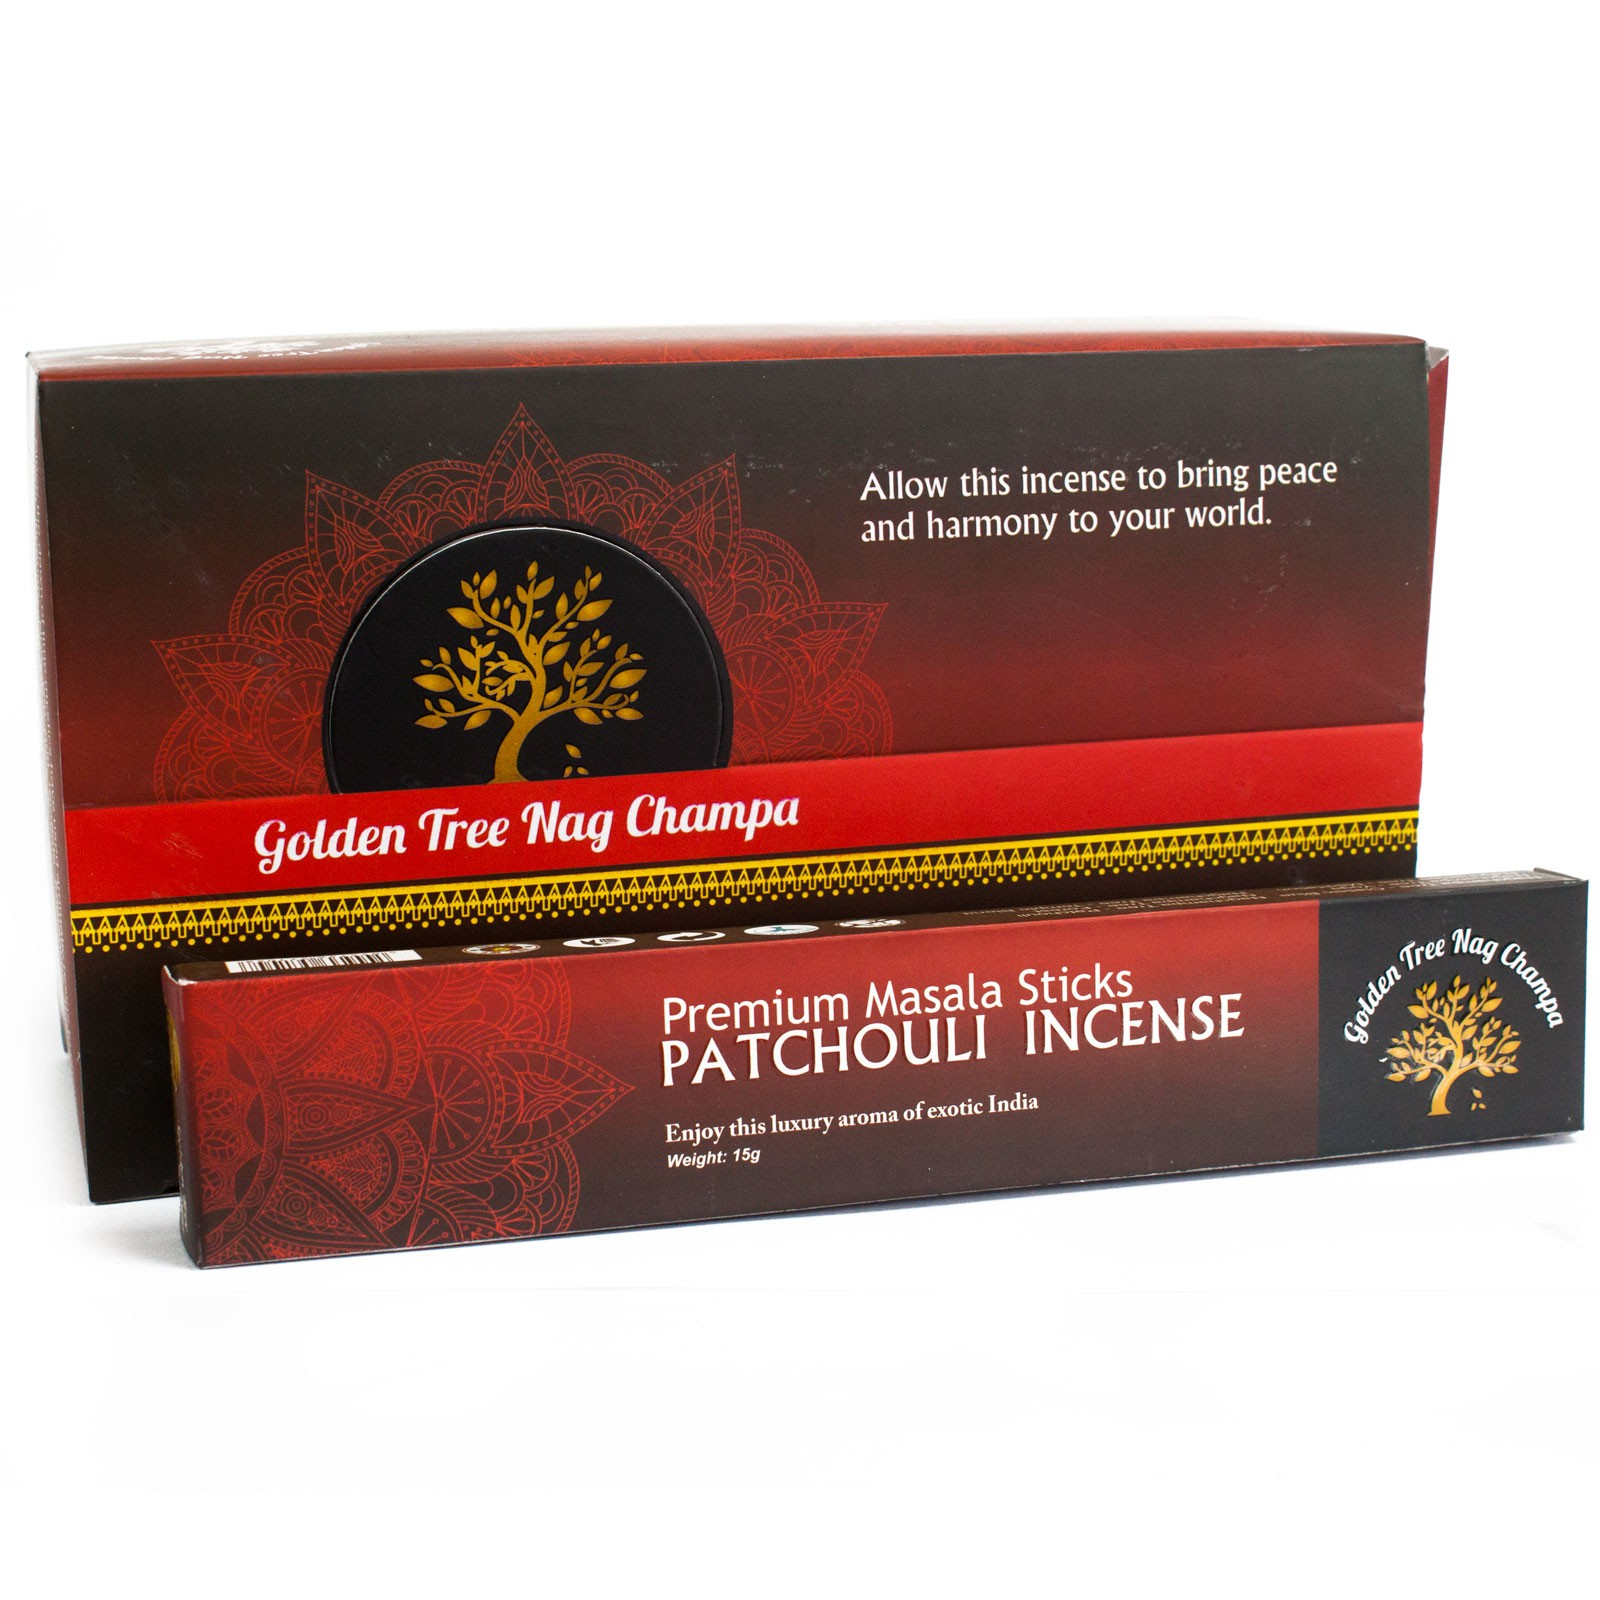 Golden Tree Nag Champa Incense Patchouli